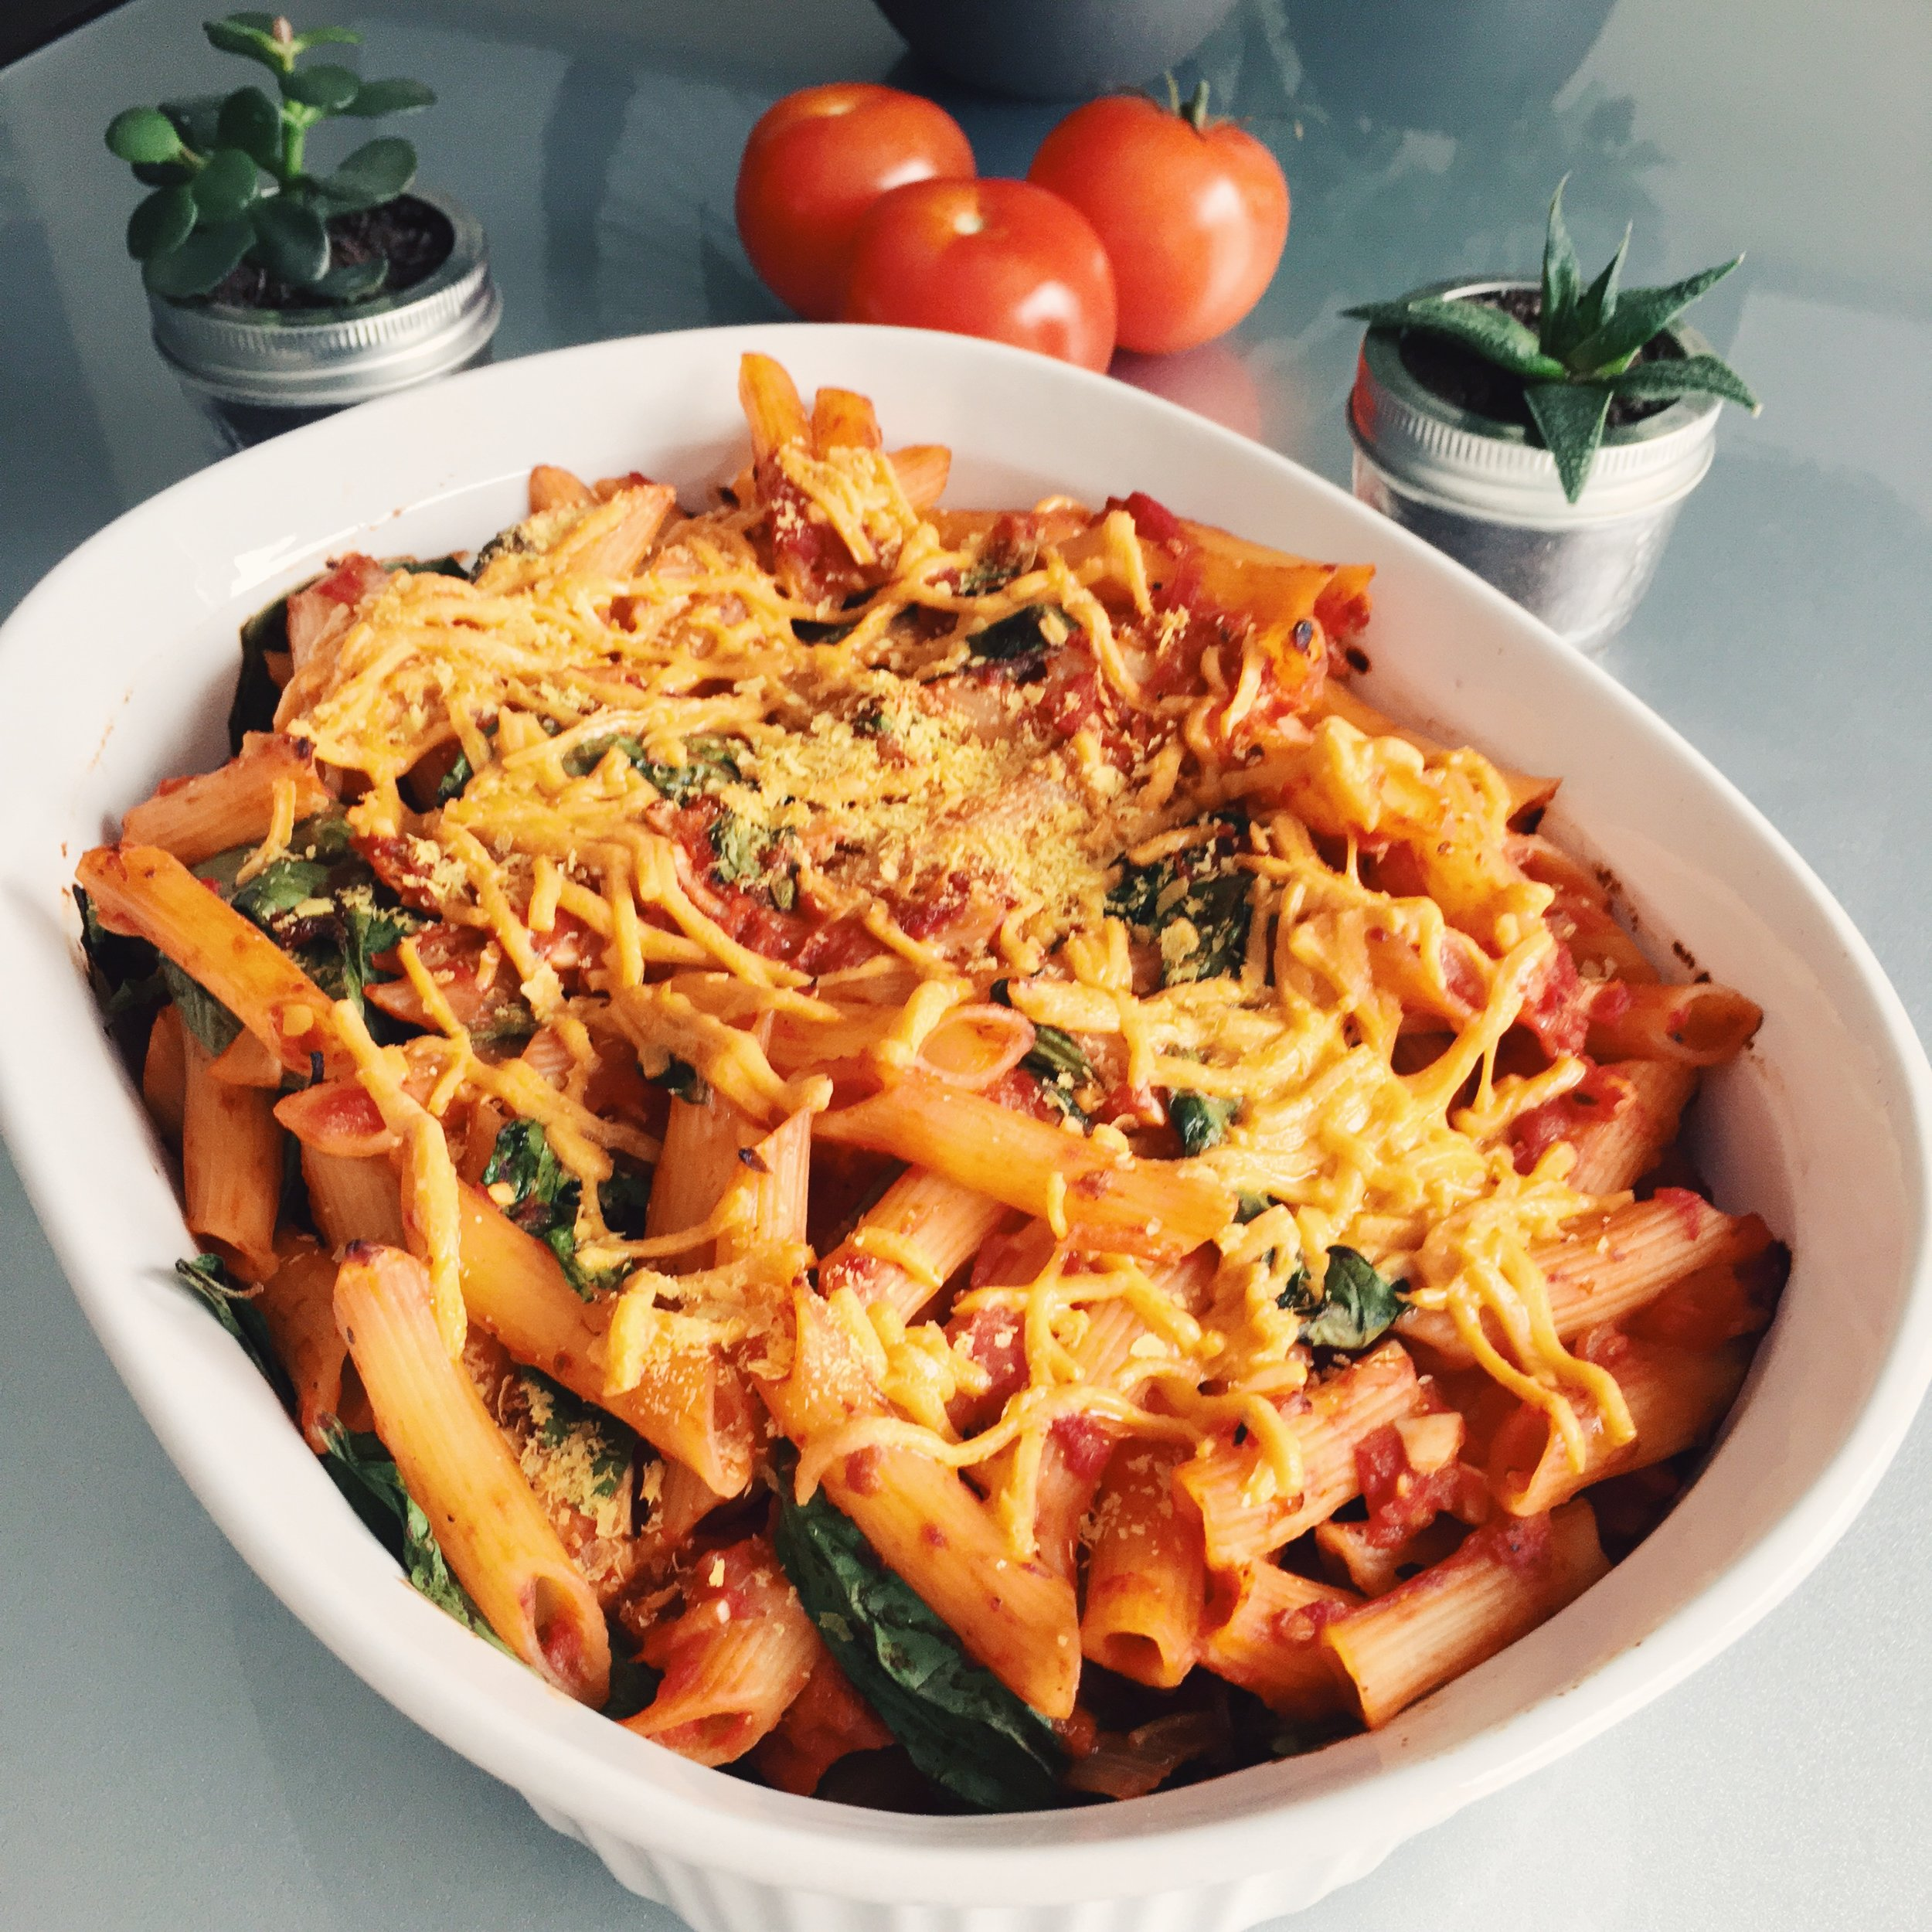 Baked Tomato Basil Pasta